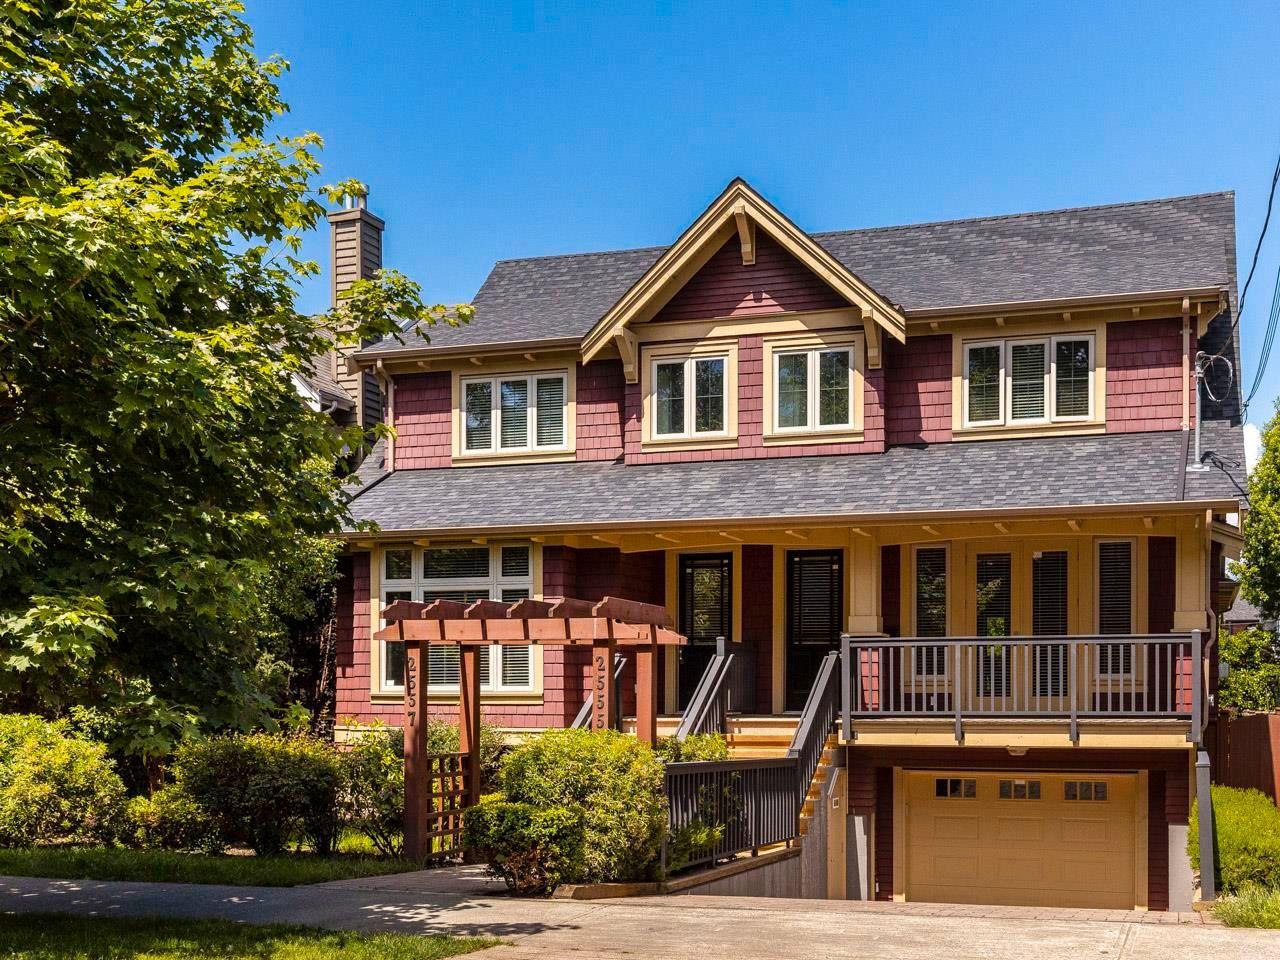 Main Photo: 2555 W 8TH AVENUE in Vancouver: Kitsilano 1/2 Duplex for sale (Vancouver West)  : MLS®# R2602597